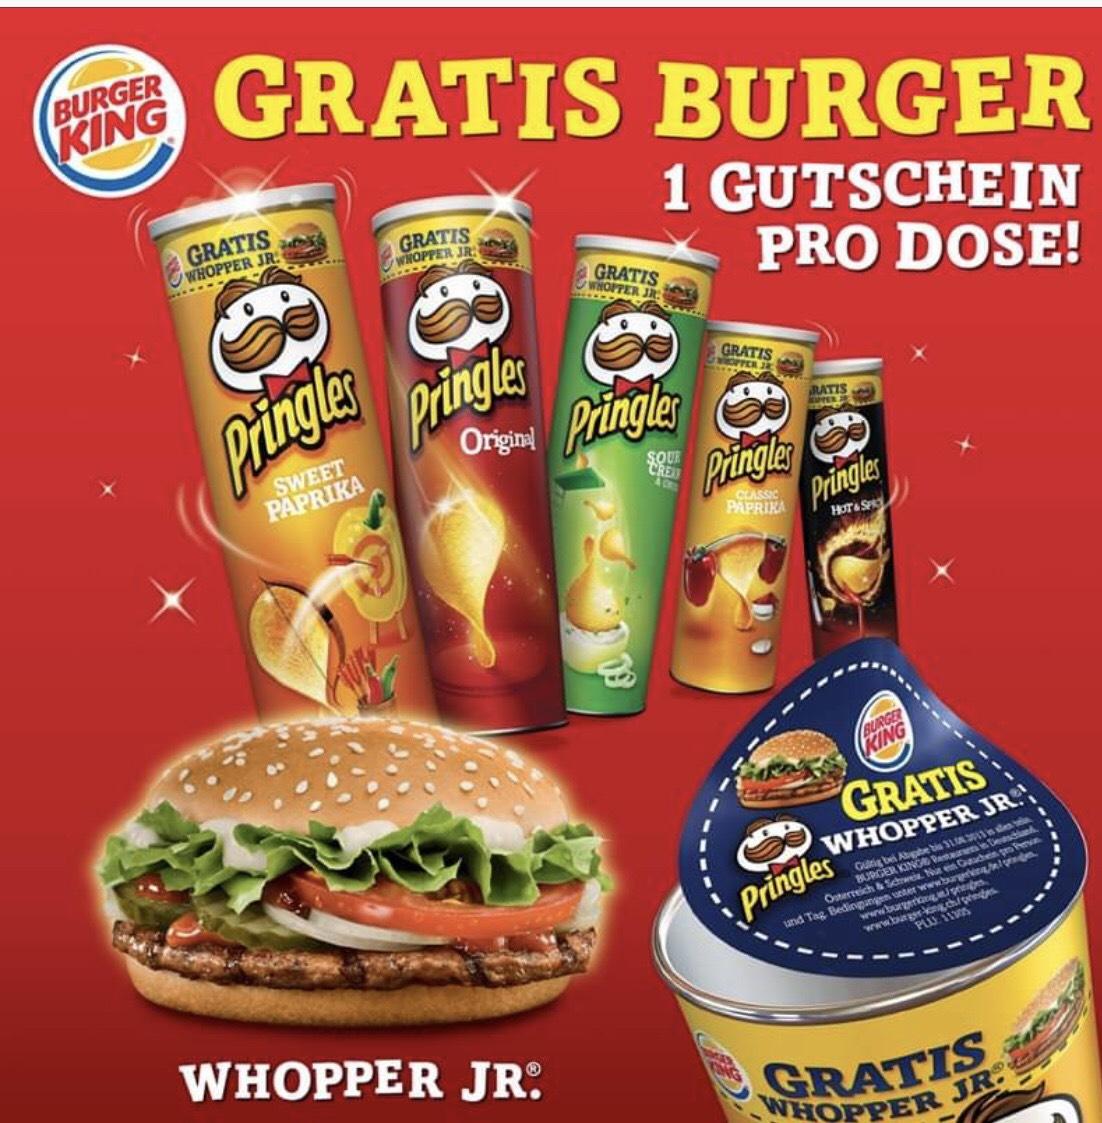 Burger King Pringles Aktion Whopper Jr. Gratis